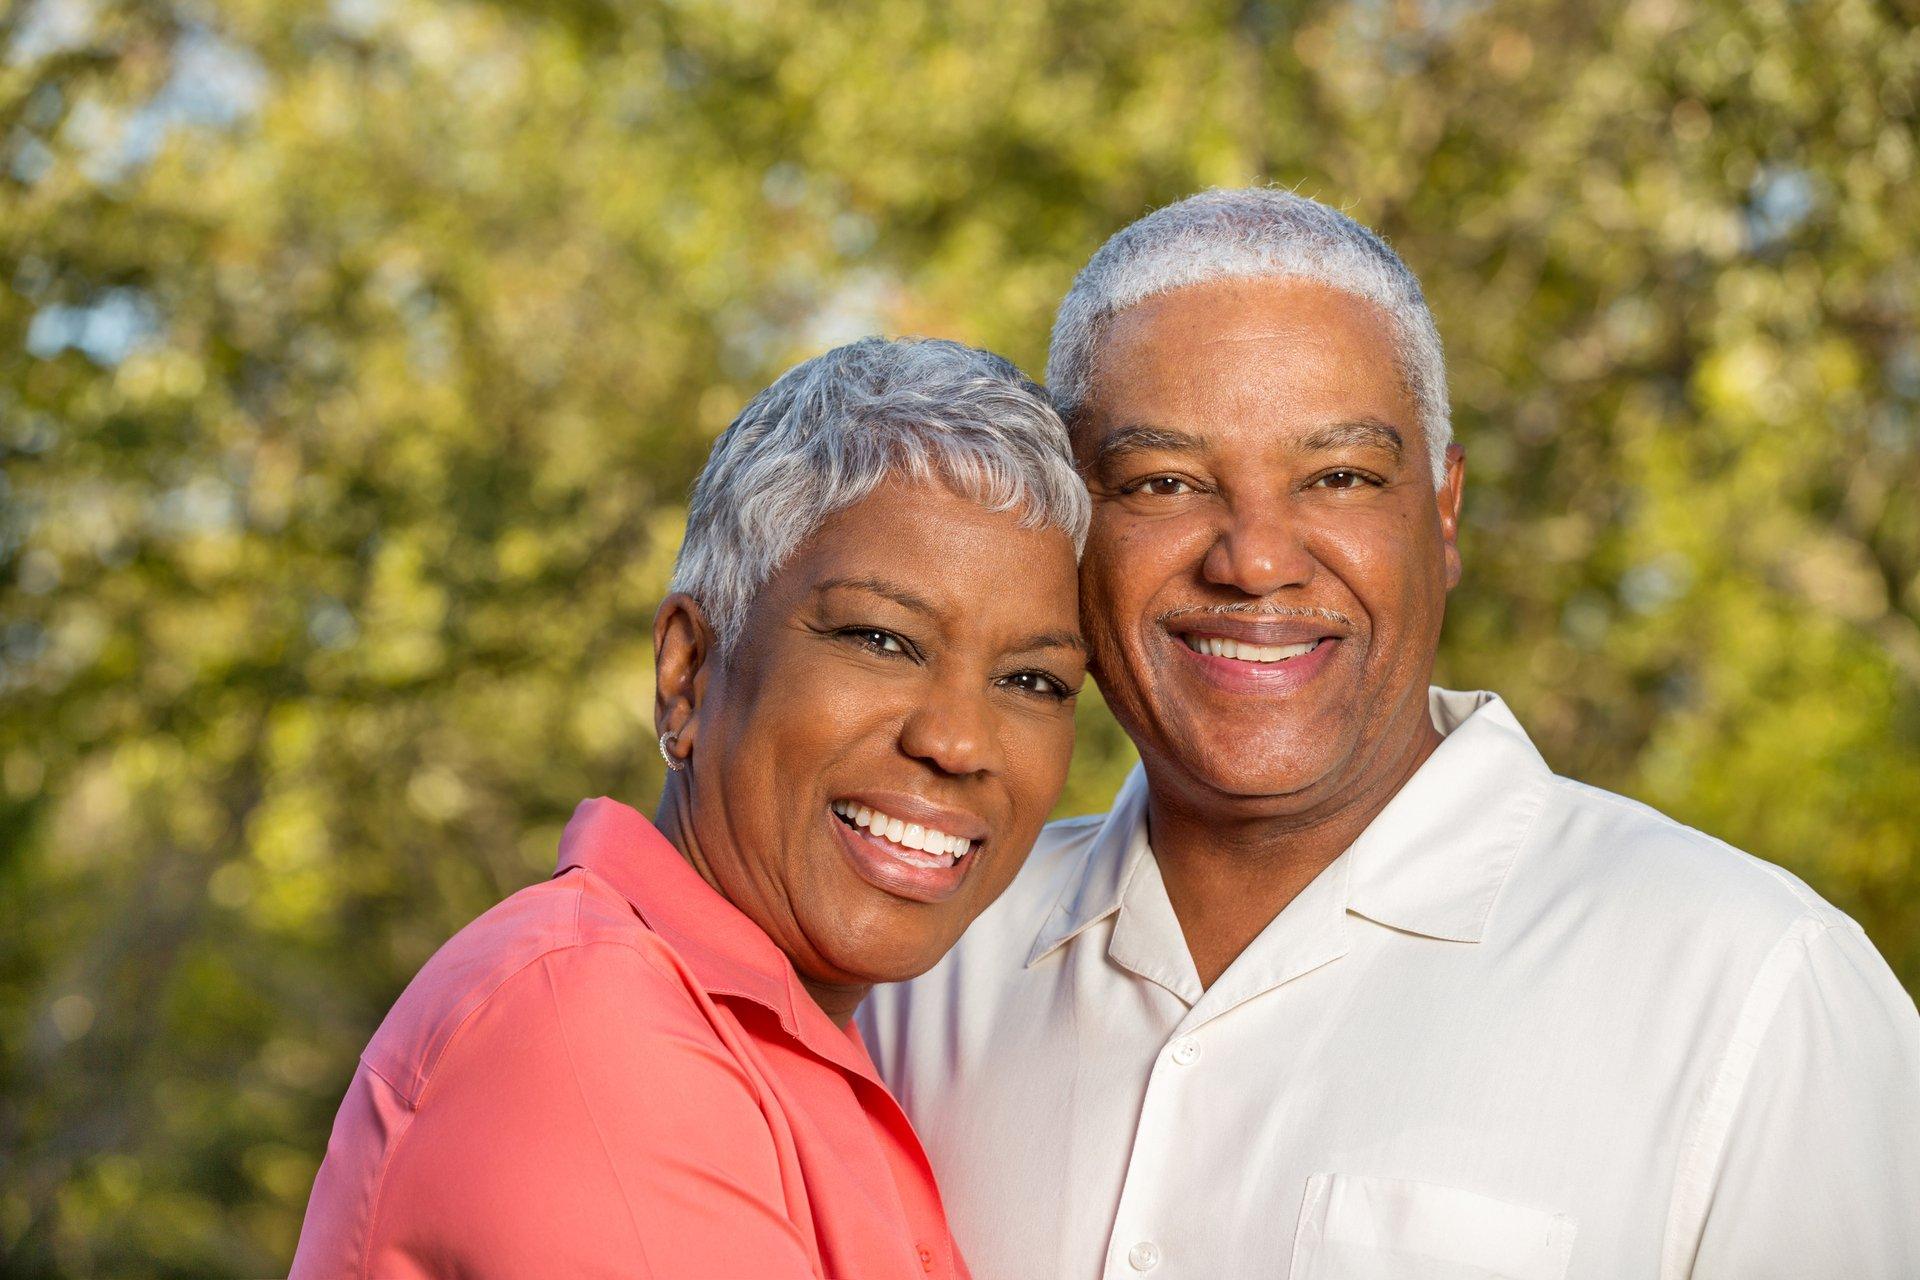 Senior black couple